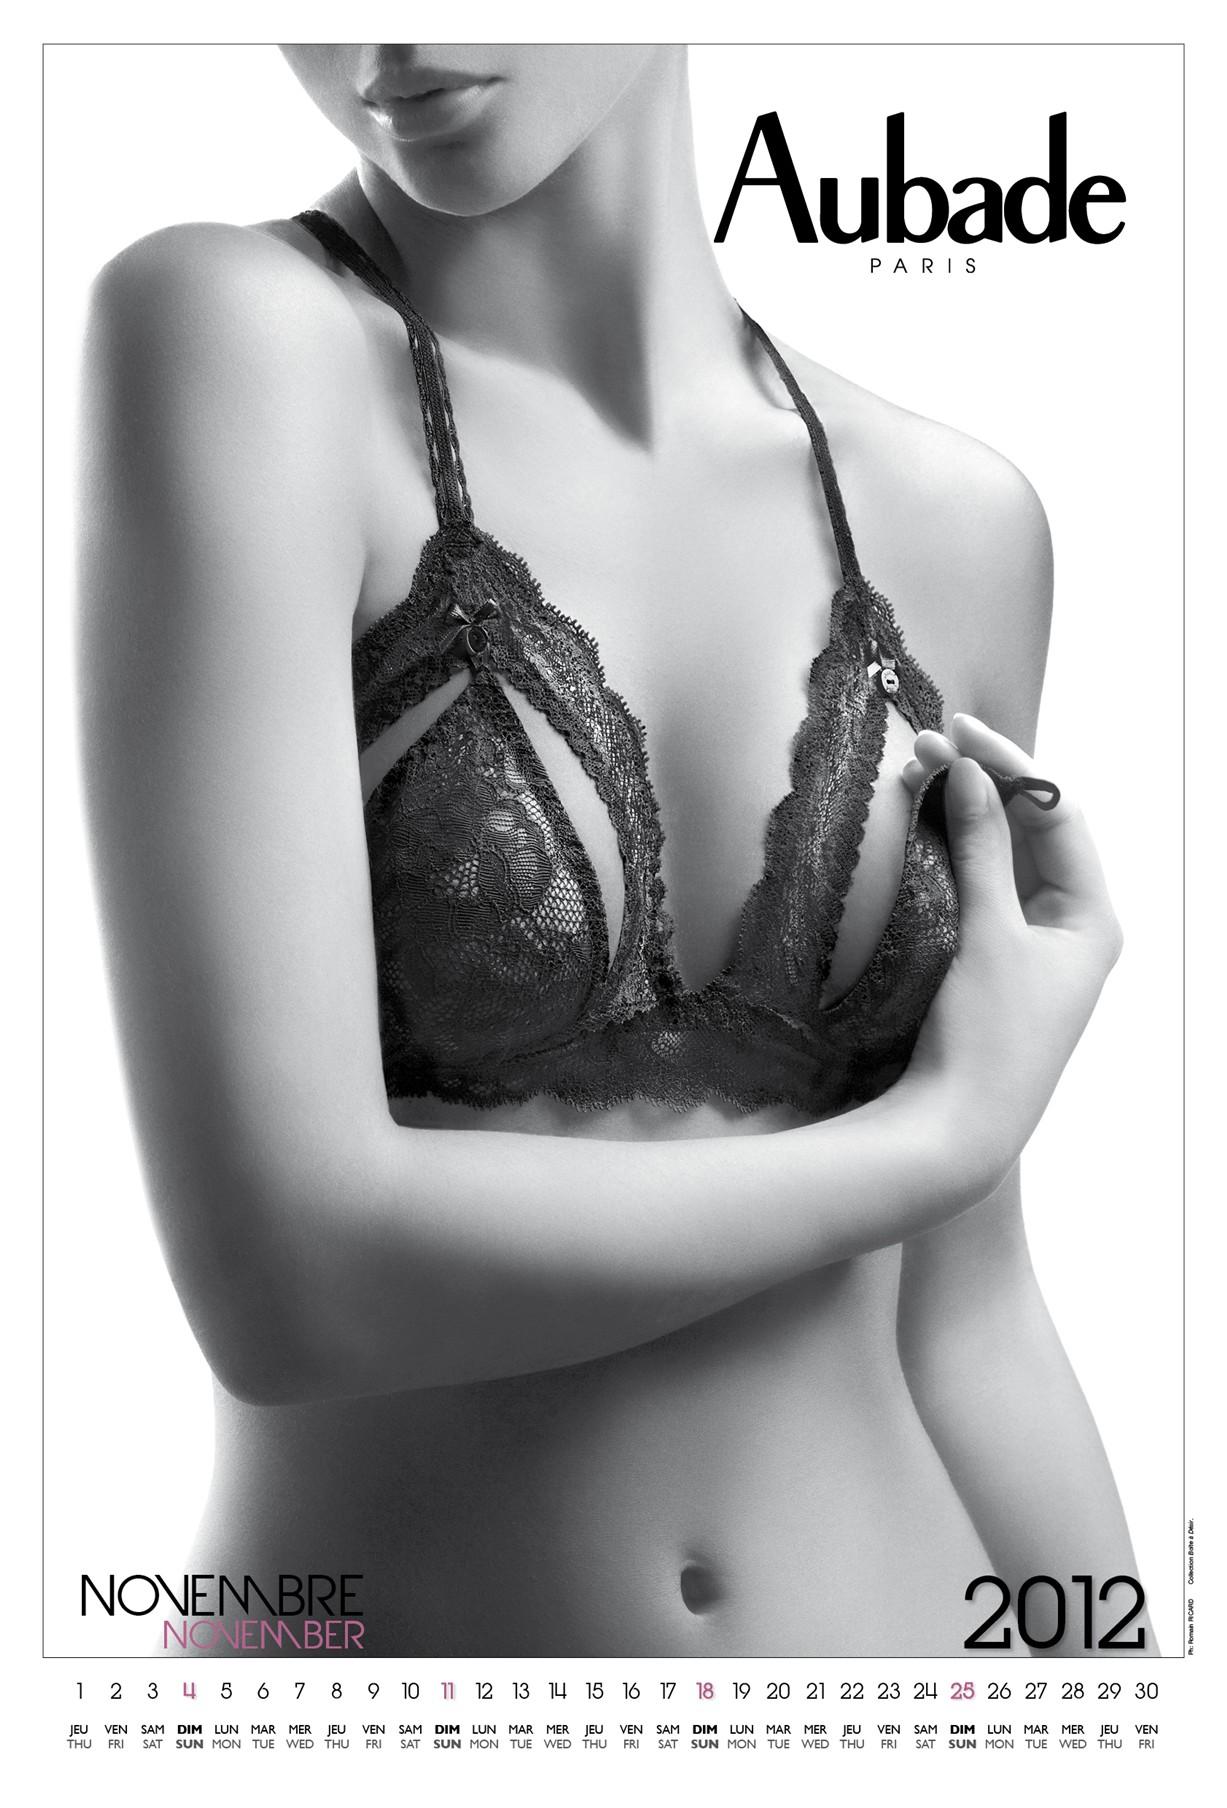 нижнее белье Aubade - календарь на 2012 год